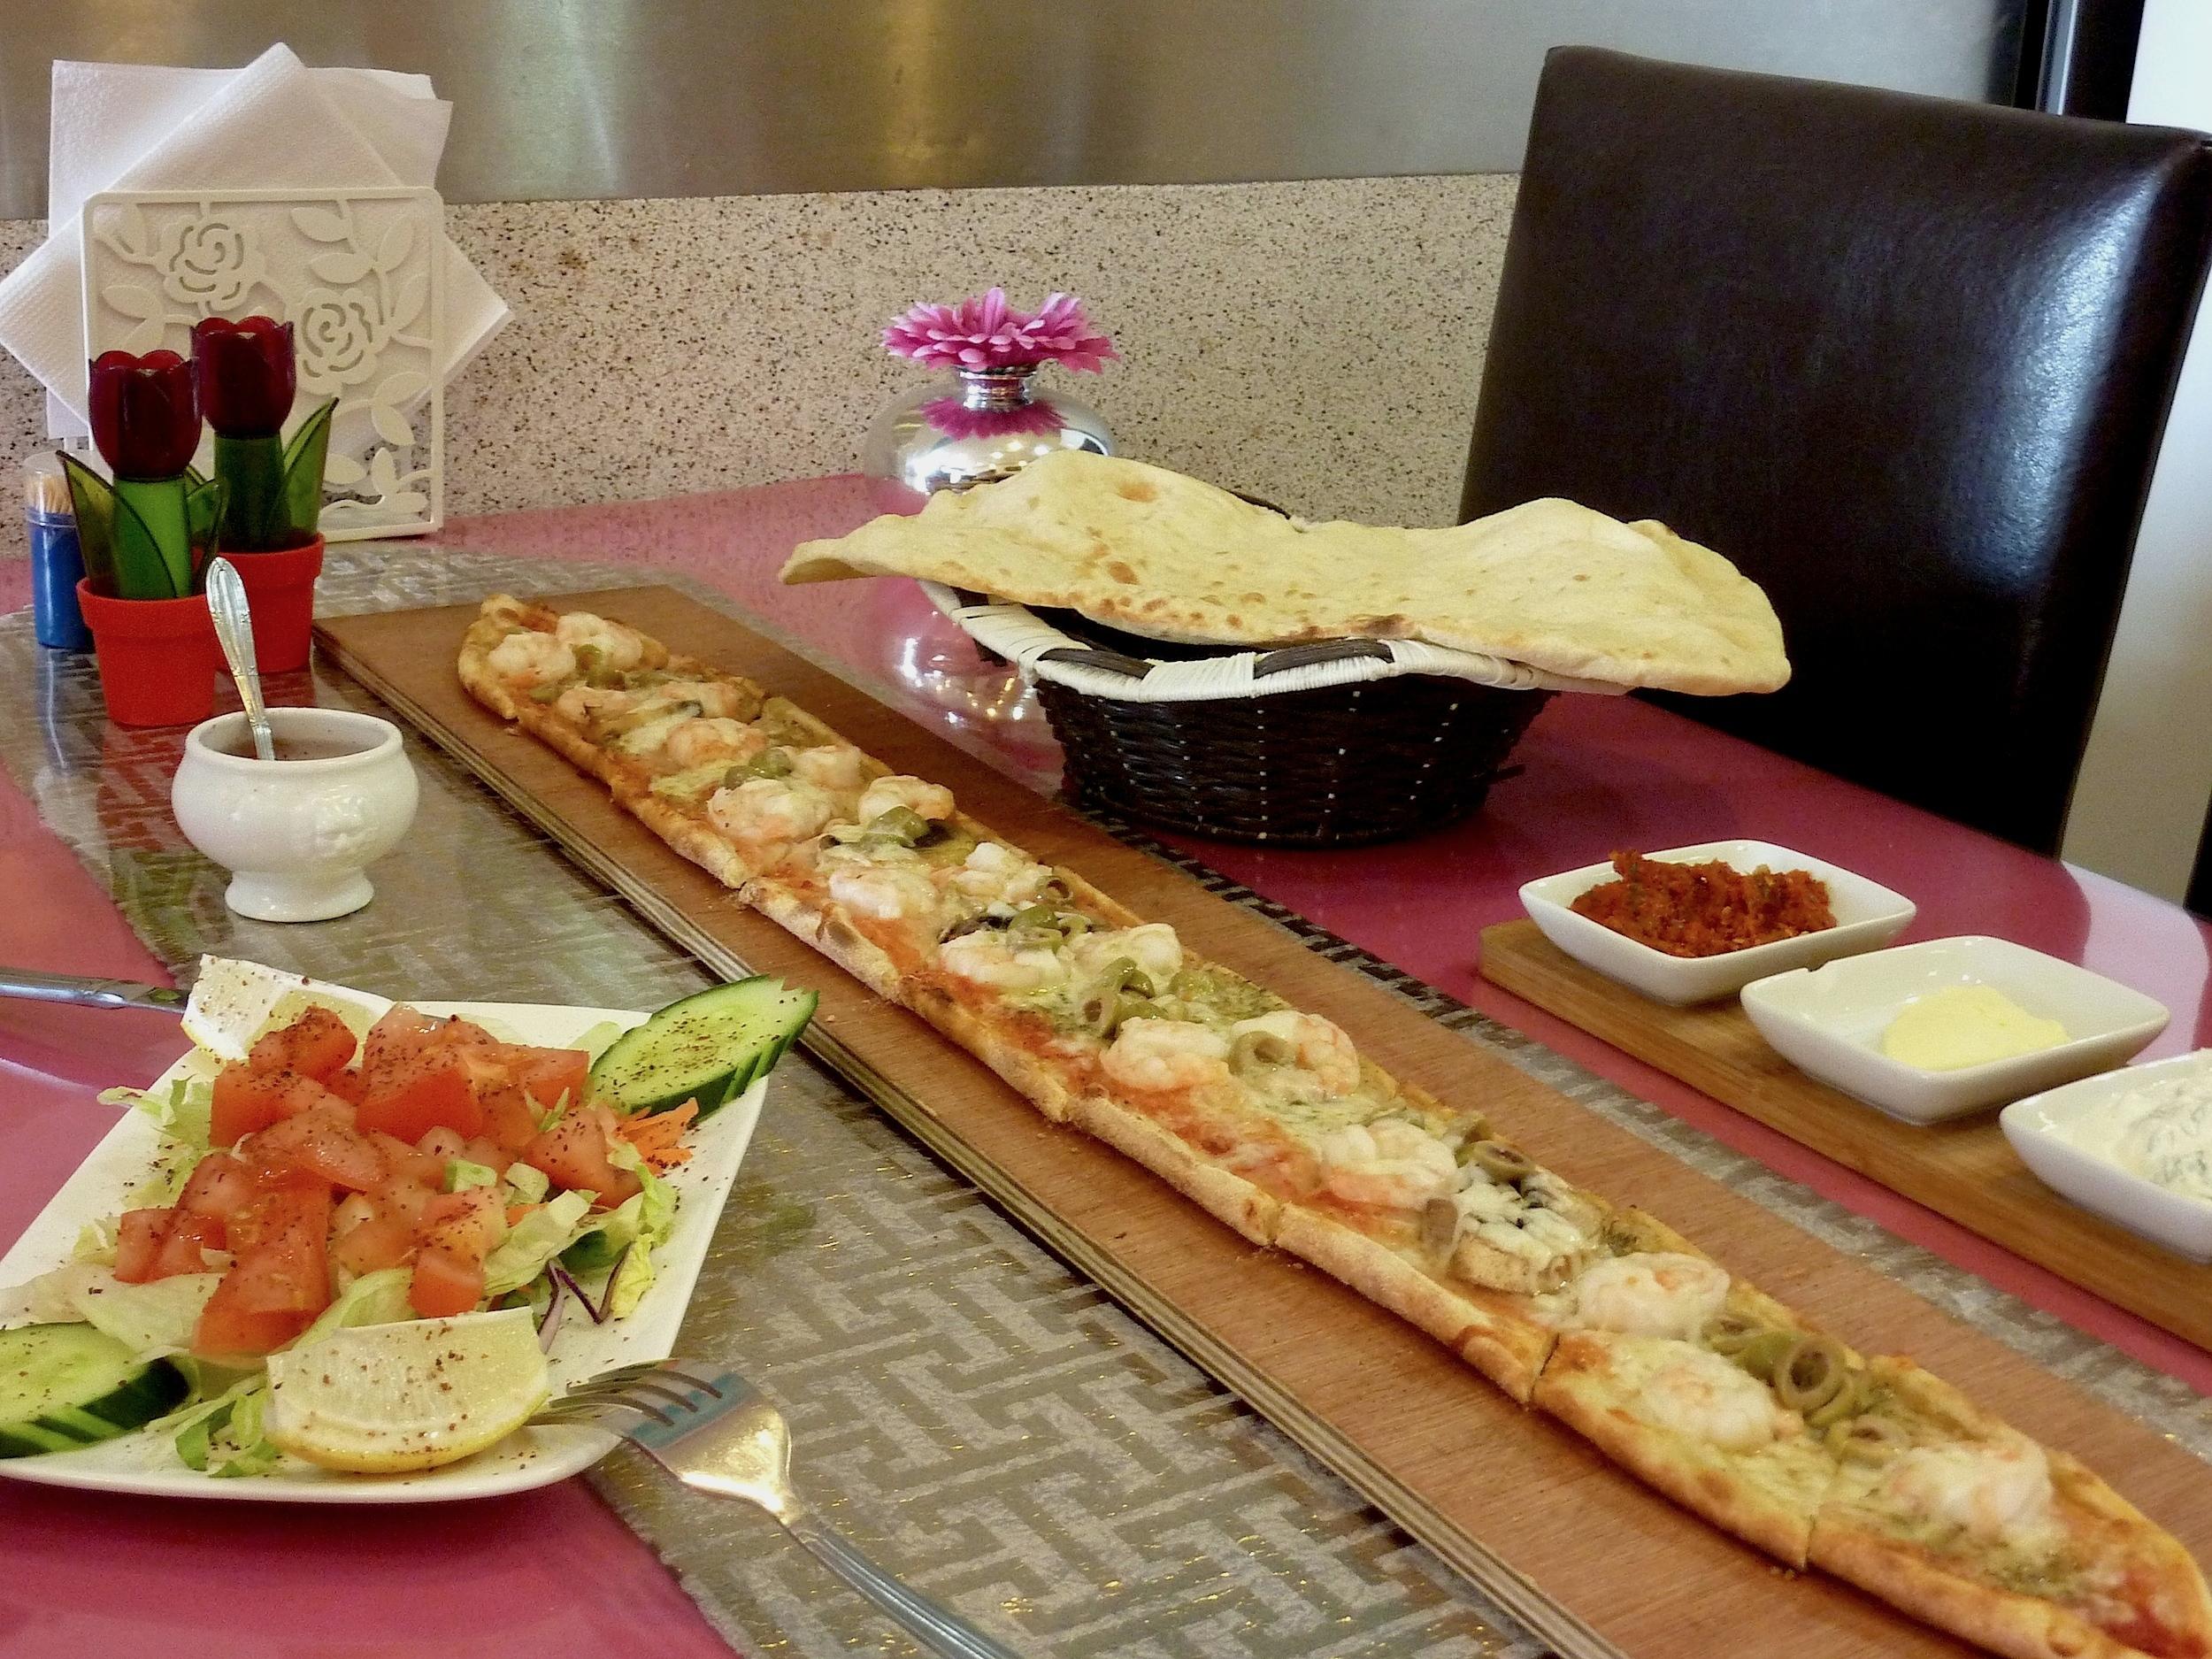 Alaturka pide grillades restaurant turc liege 4000 - Cuisine turc traditionnel ...